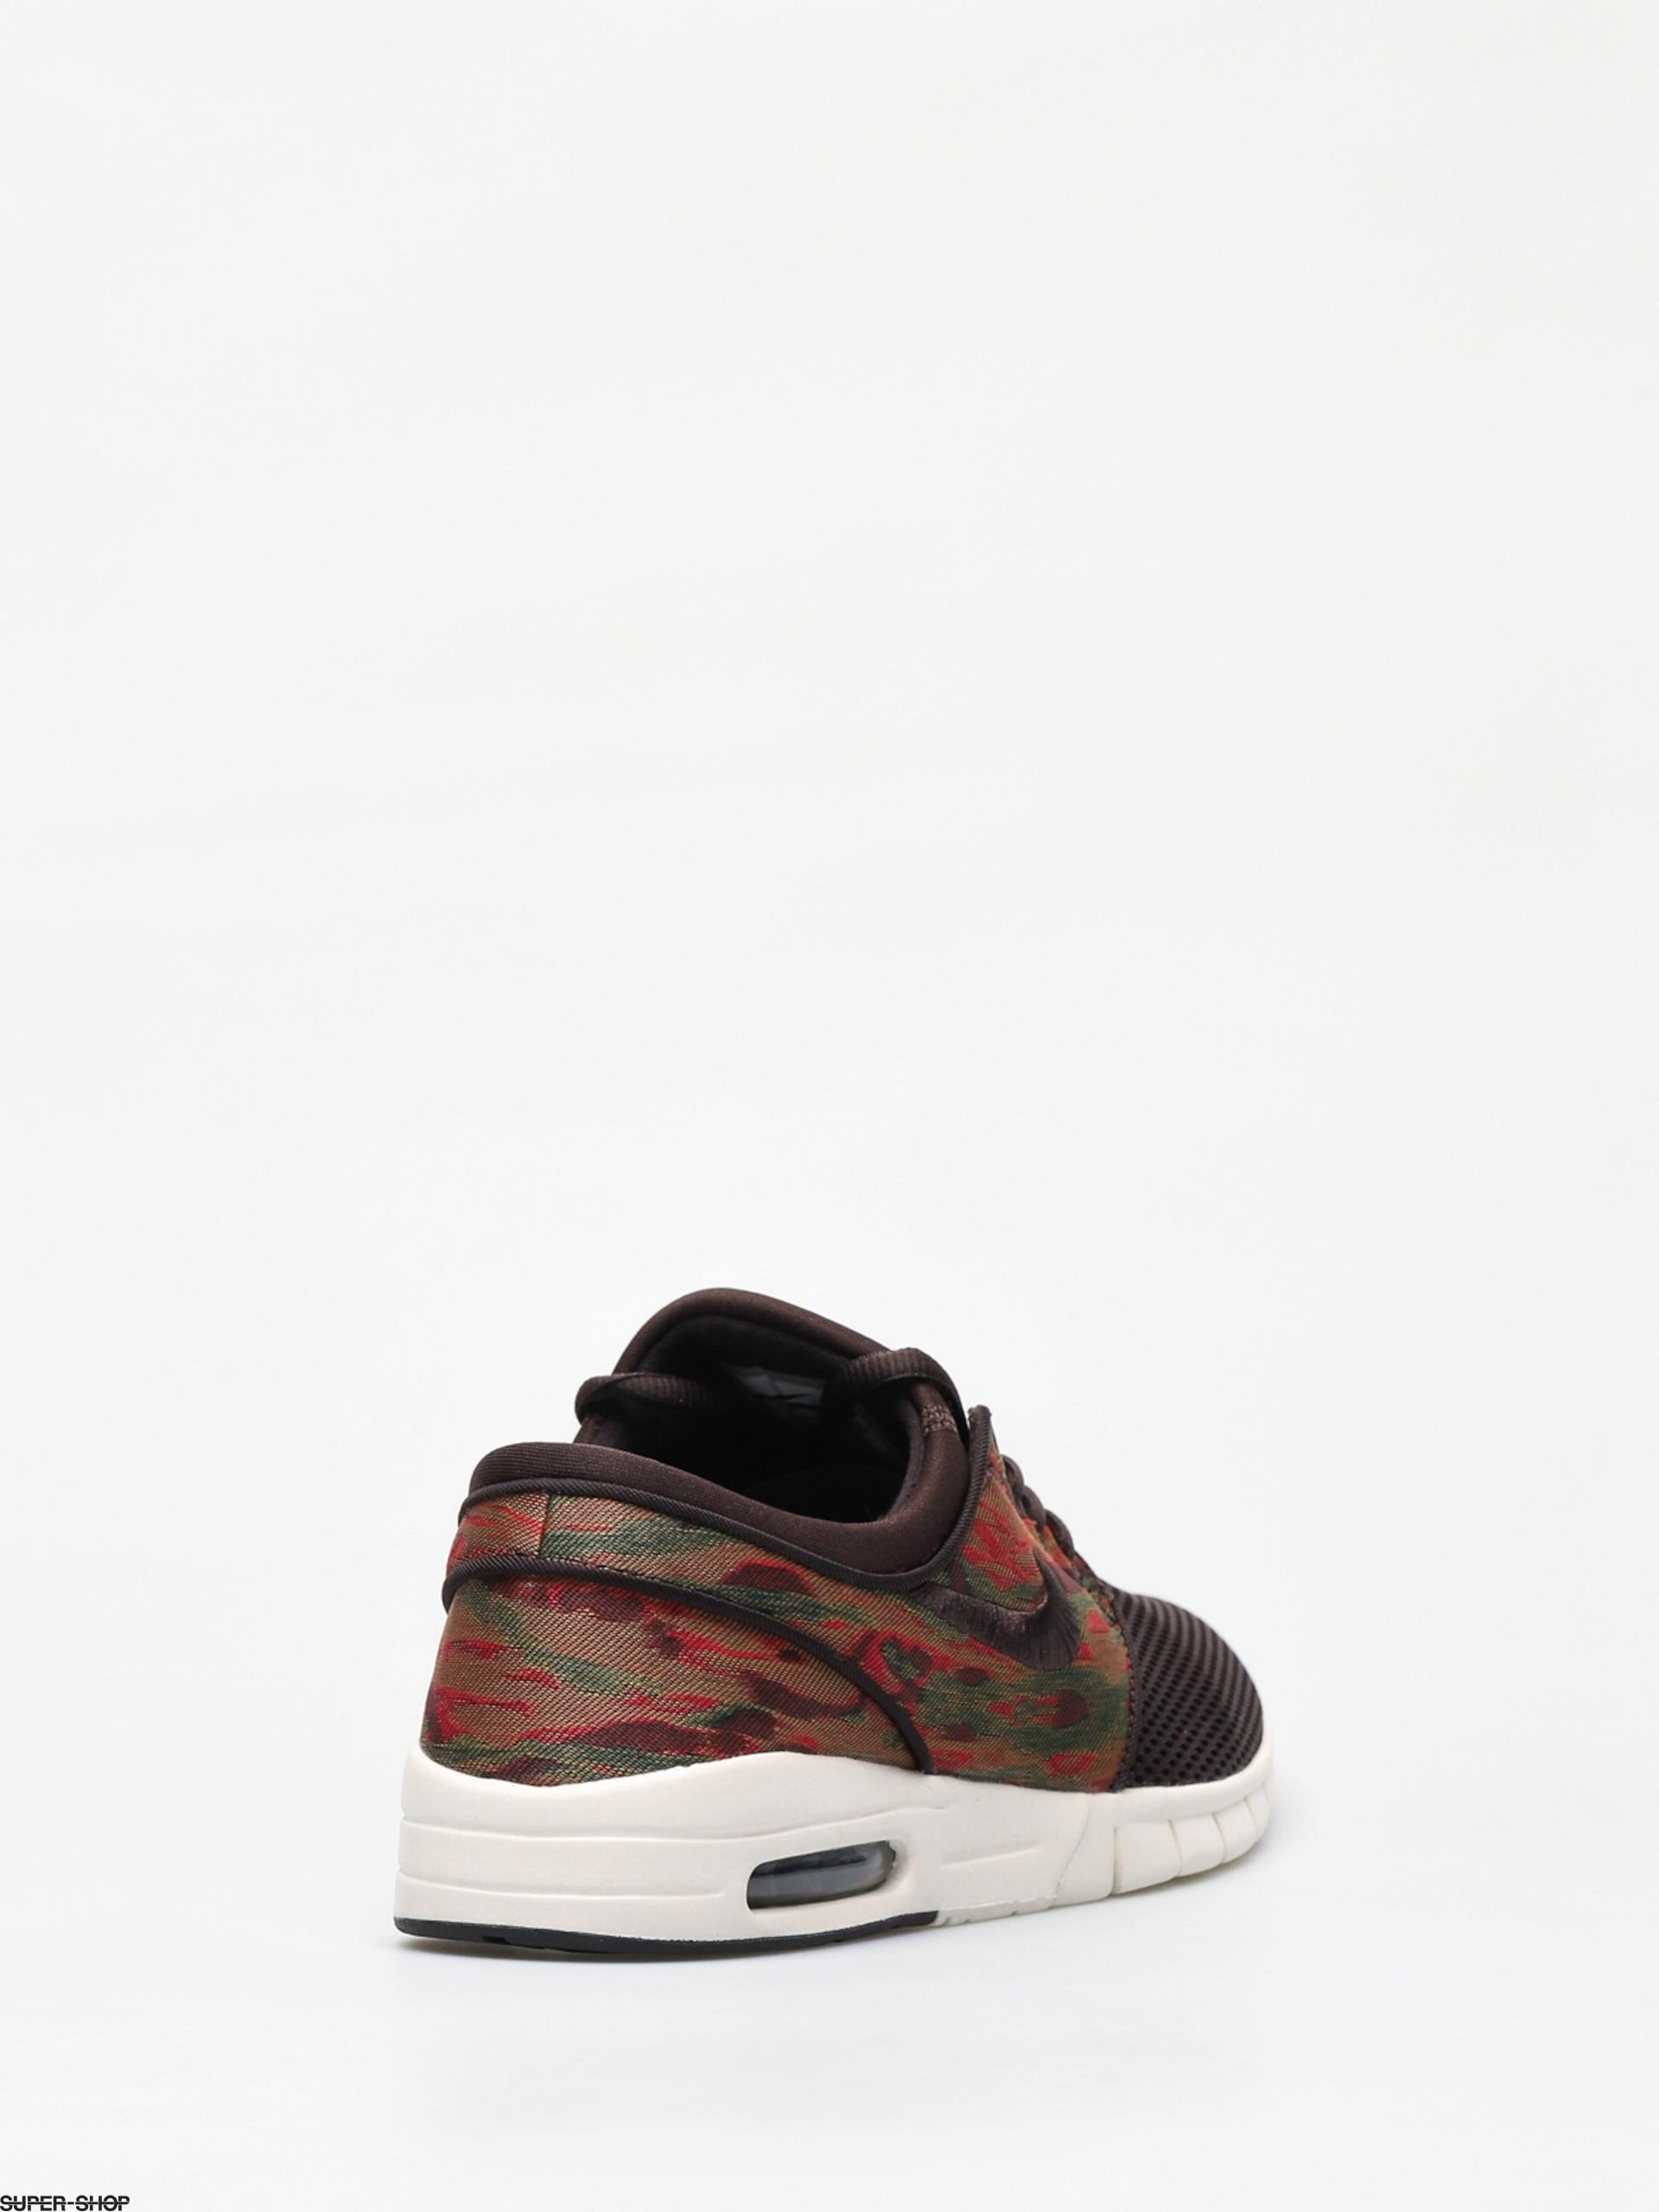 Nike SB Stefan Janoski Max Shoes (velvet brown velvet brown sail) 4ddc223a3